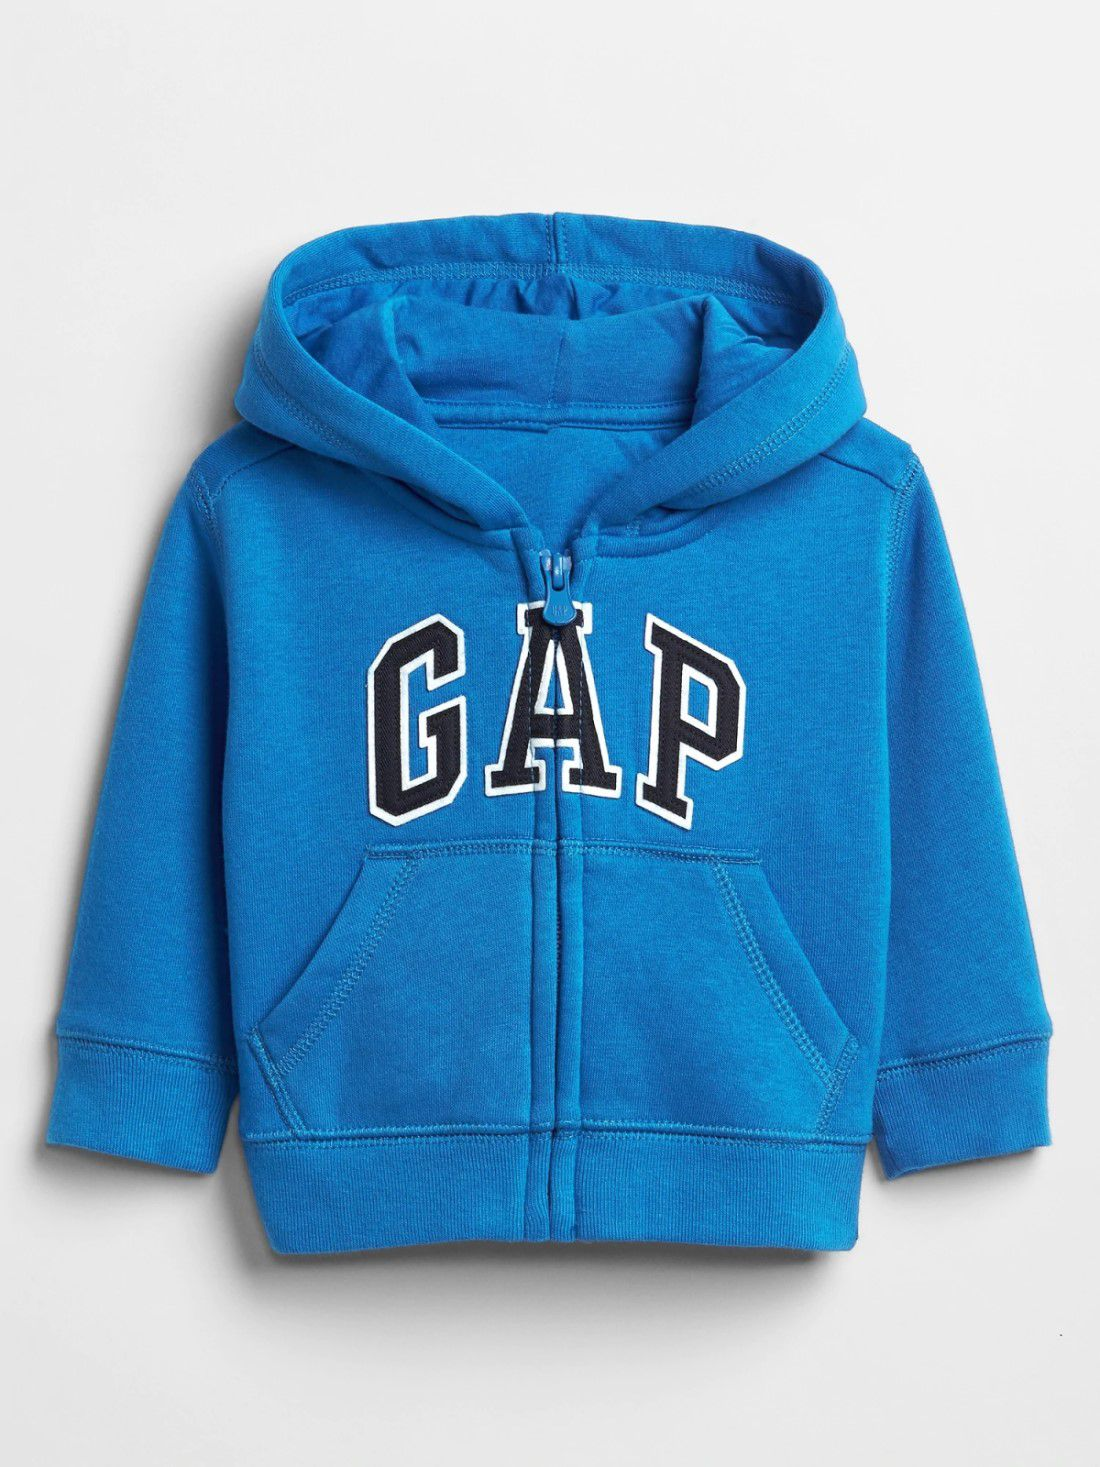 Moletom GAP Azul/ Cinza com Zíper